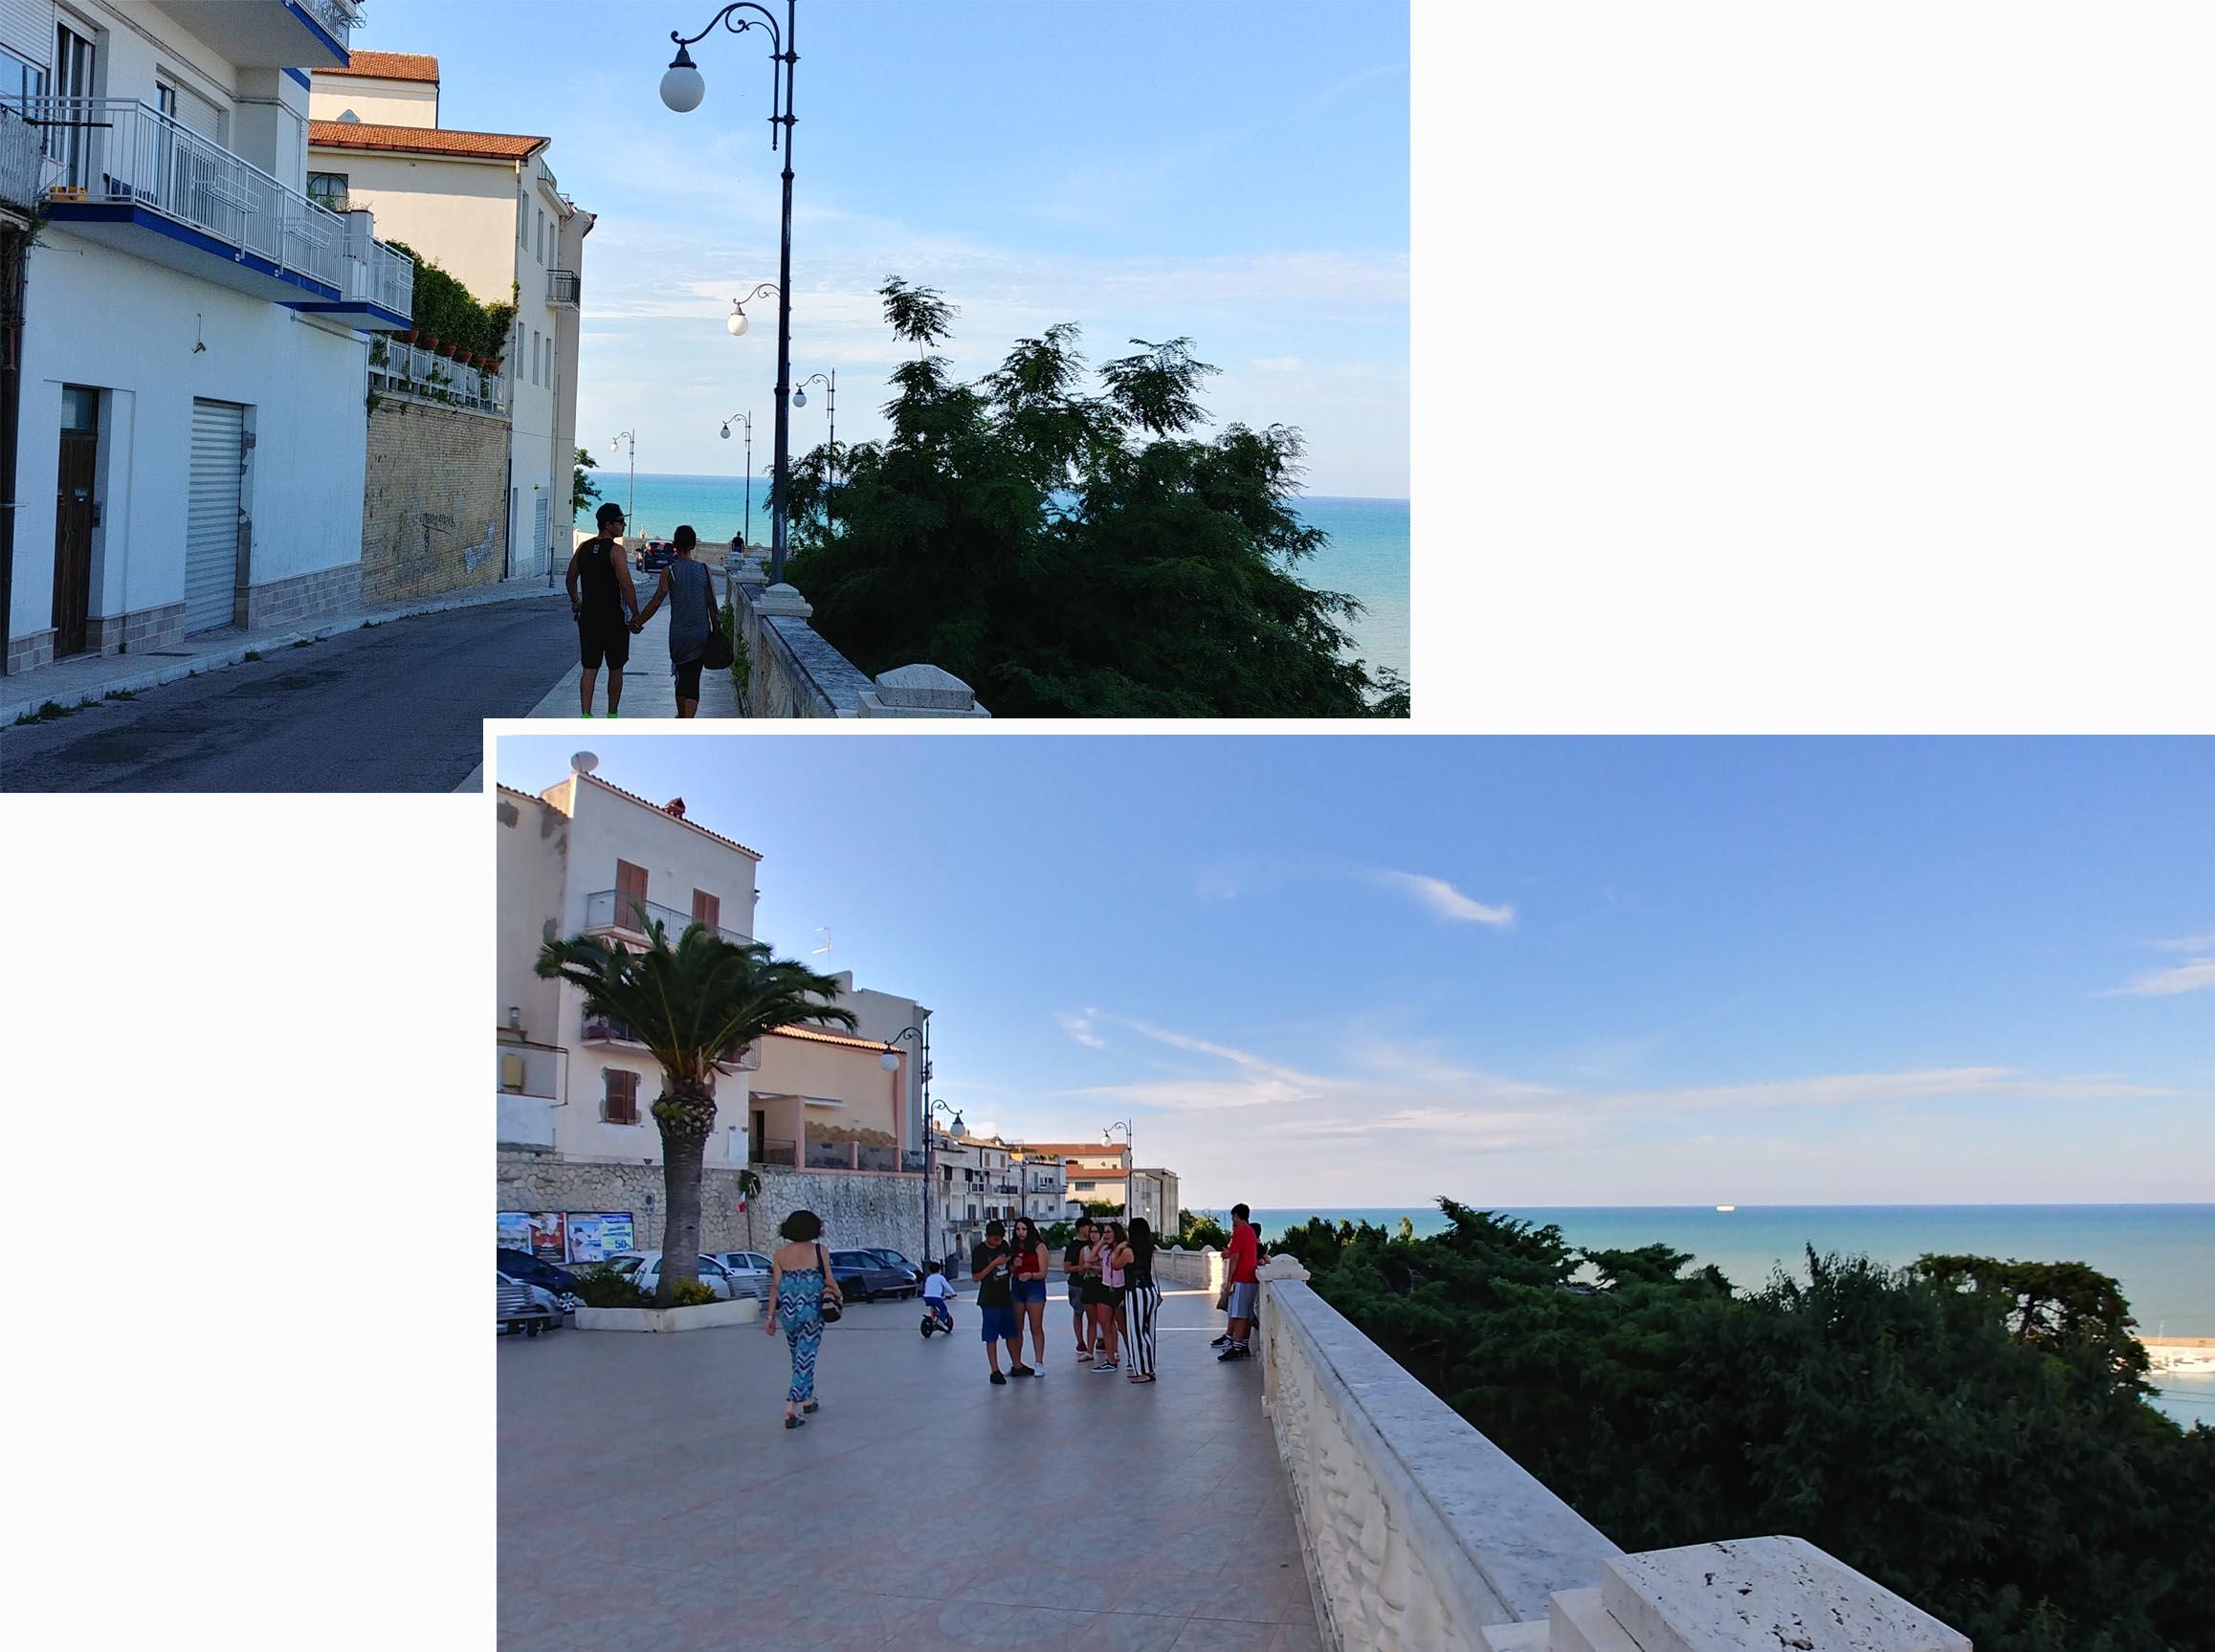 Promenade over looking the Ortano marina